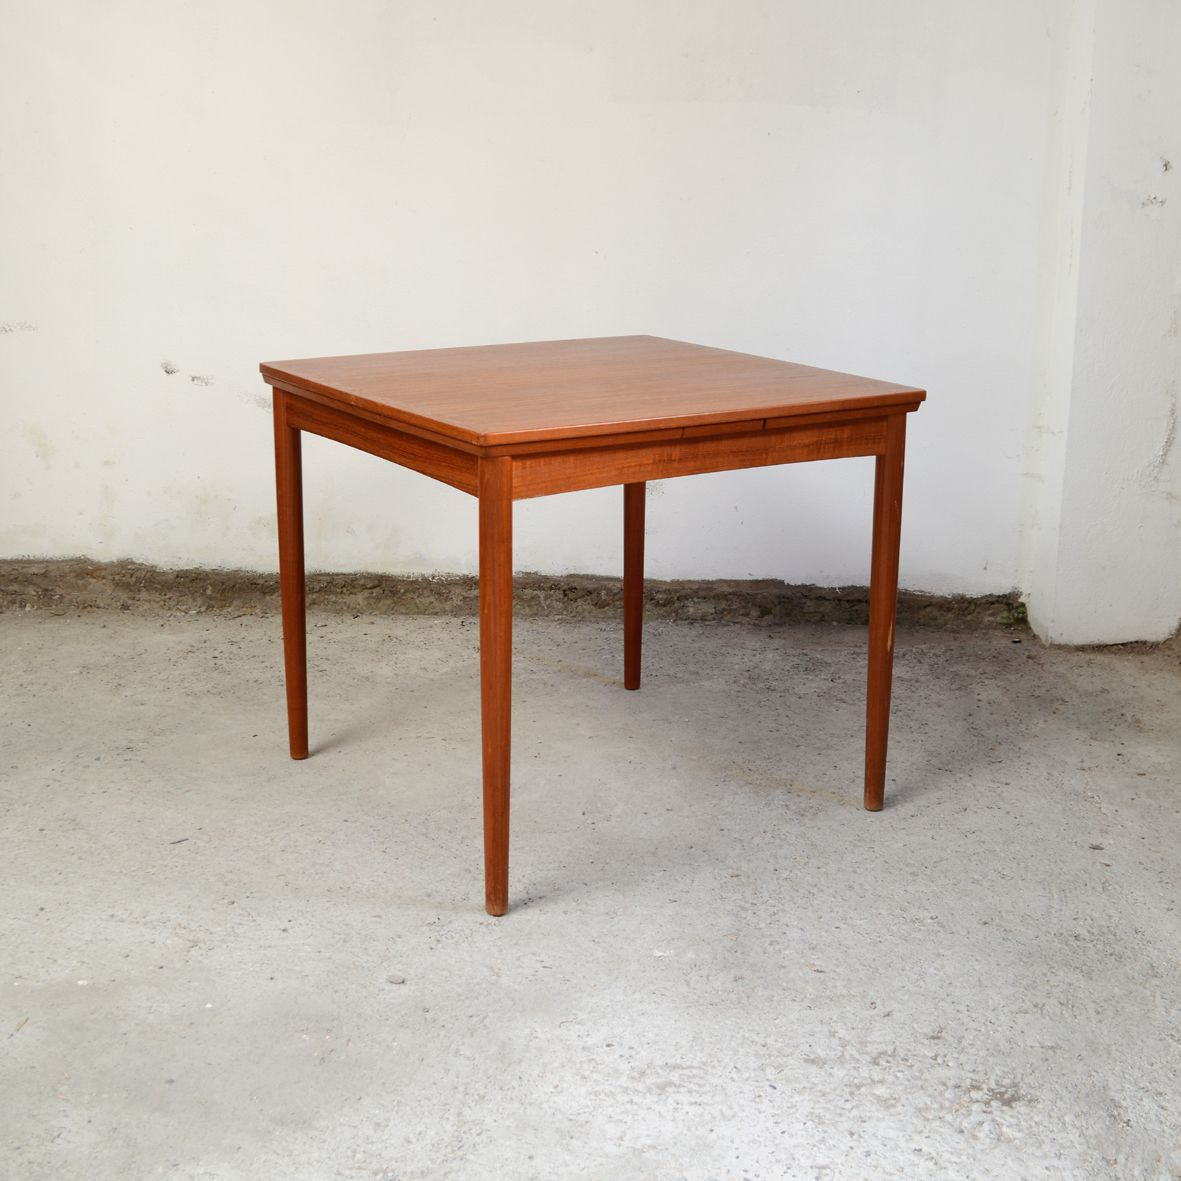 mid century teak square dining room table by poul hundevad for hundevad co for sale at pamono. Black Bedroom Furniture Sets. Home Design Ideas